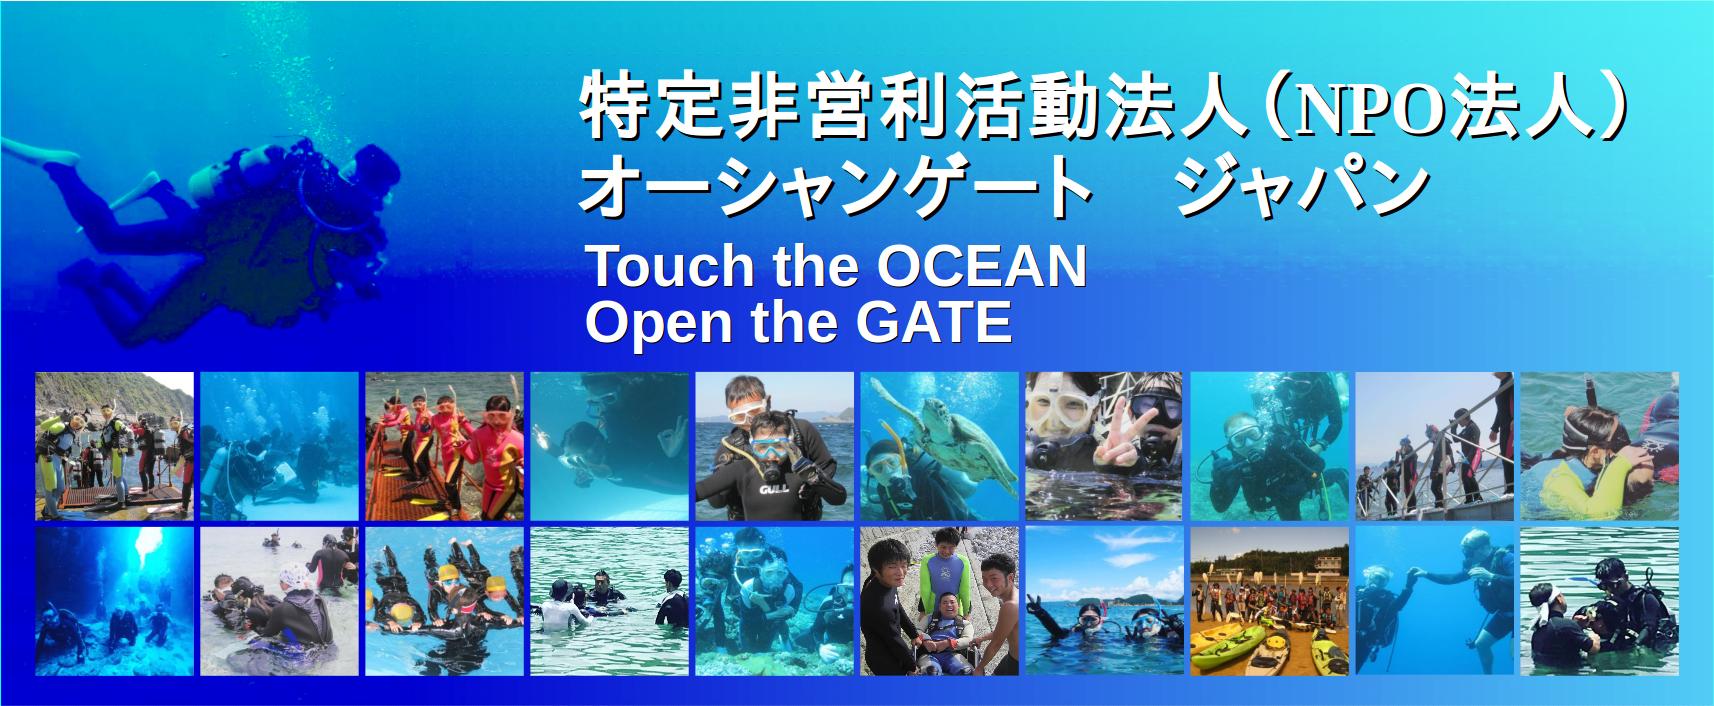 NPO法人 オーシャンゲート ジャパン